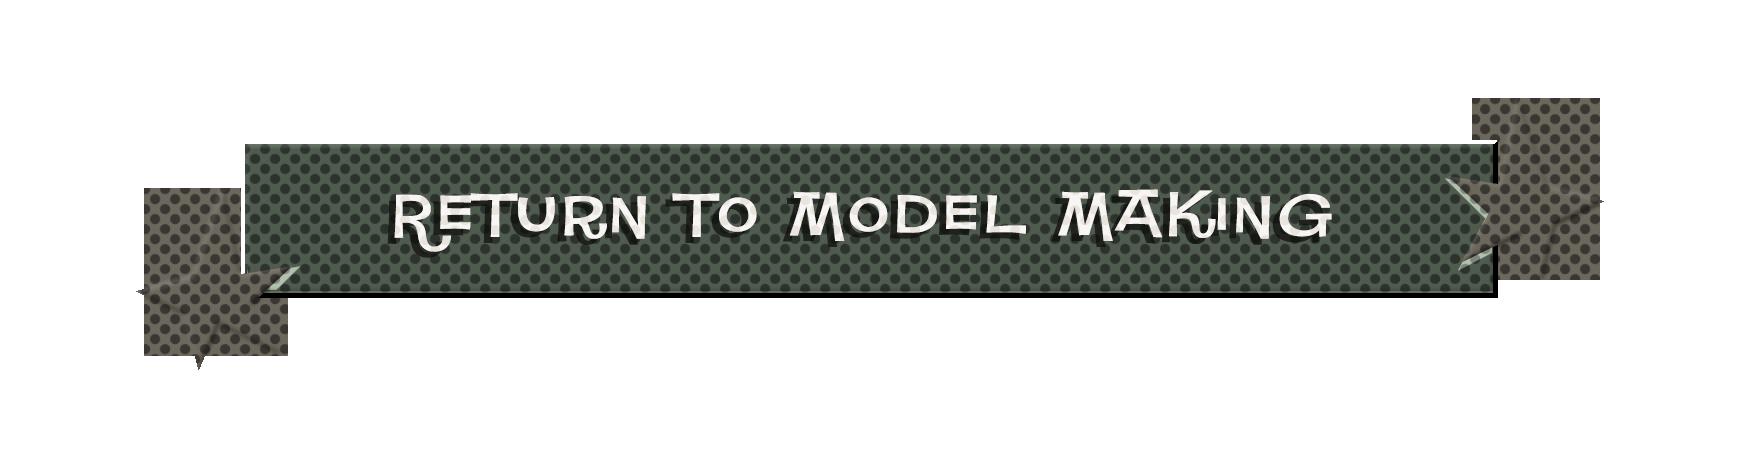 RETURN TO MODEL MAKING.png